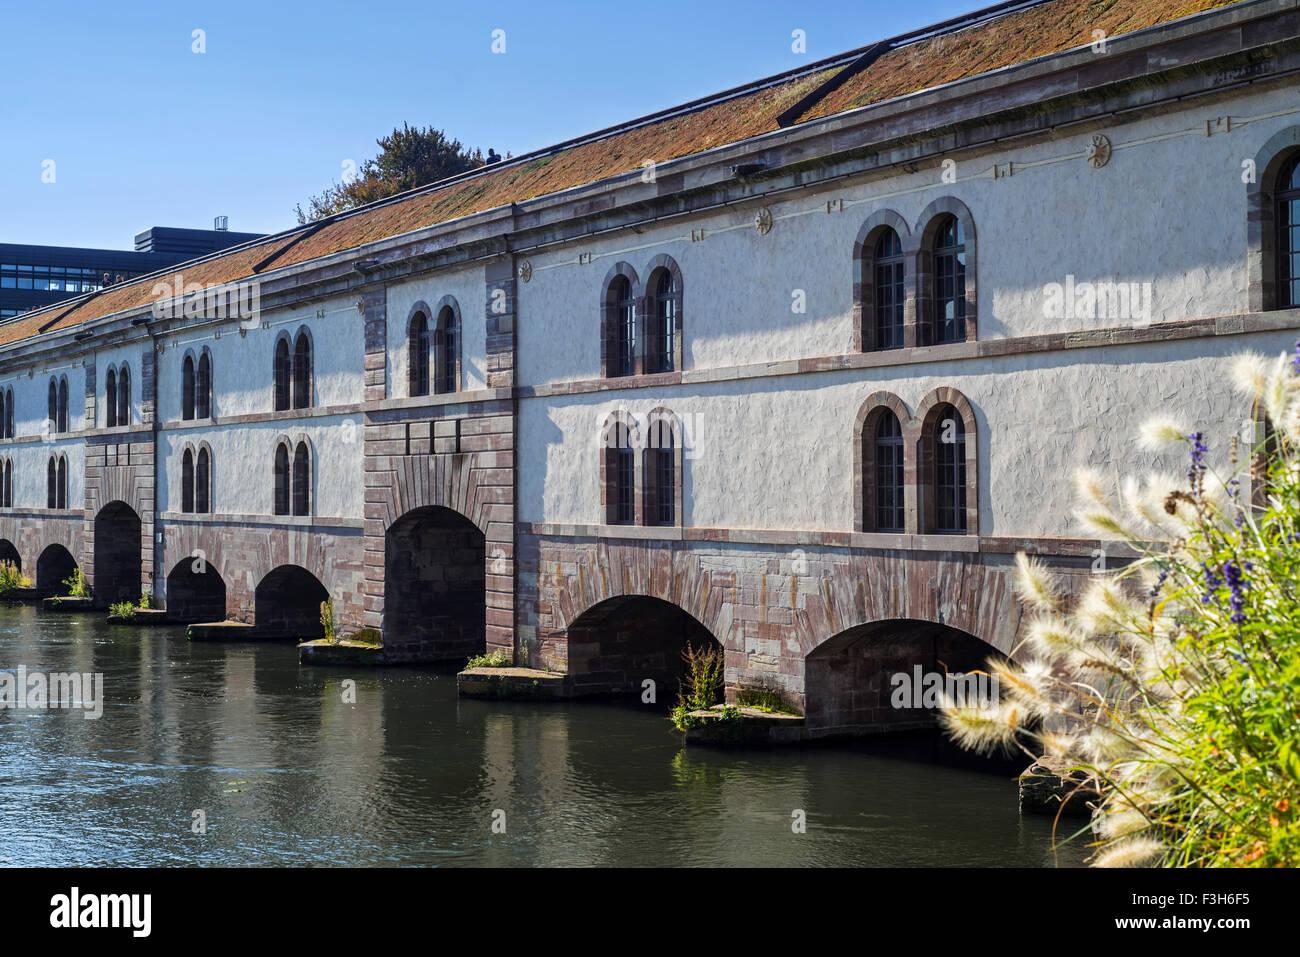 The Barrage Vauban / Vauban Dam over the River Ill at Strasbourg, Alsace, France - Stock Image